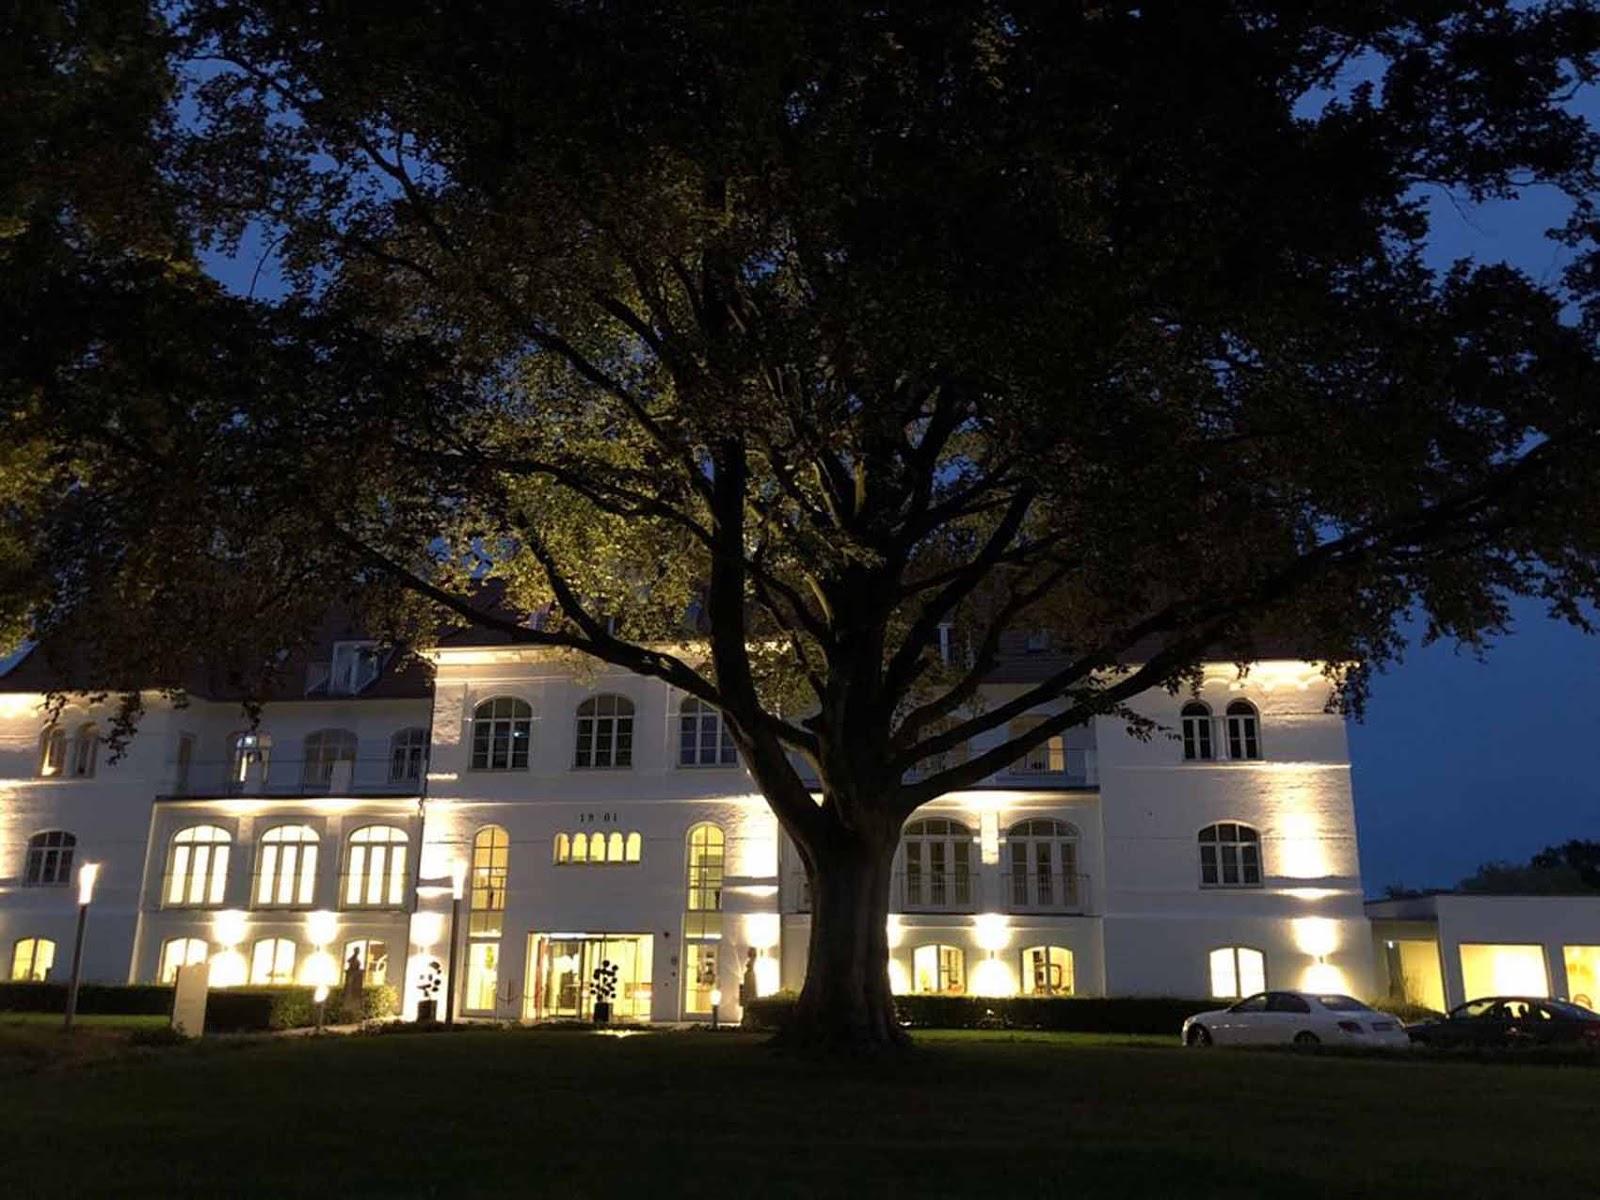 Børkop Brejning Comwell Kellers Park kartano hotelli